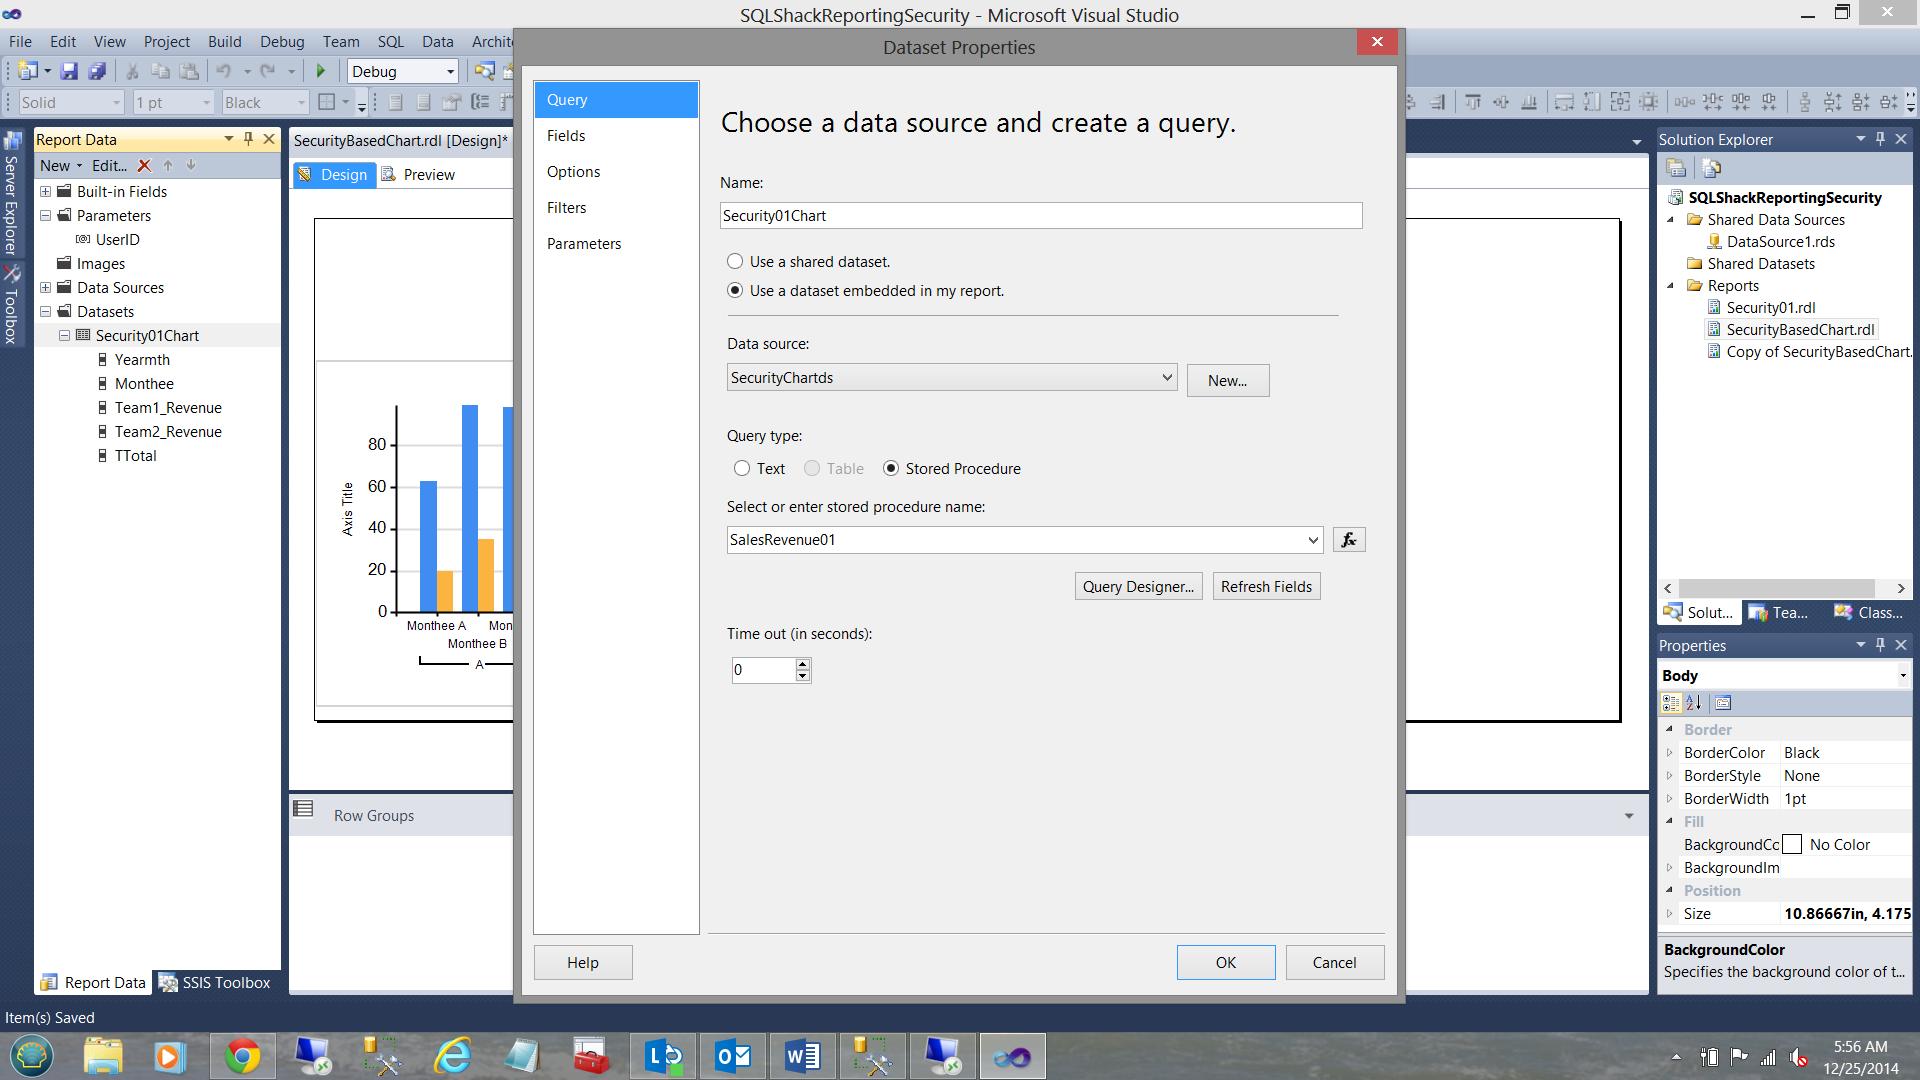 SQL Server安全机制–如何控制用户能够在报告中查看哪些数据31